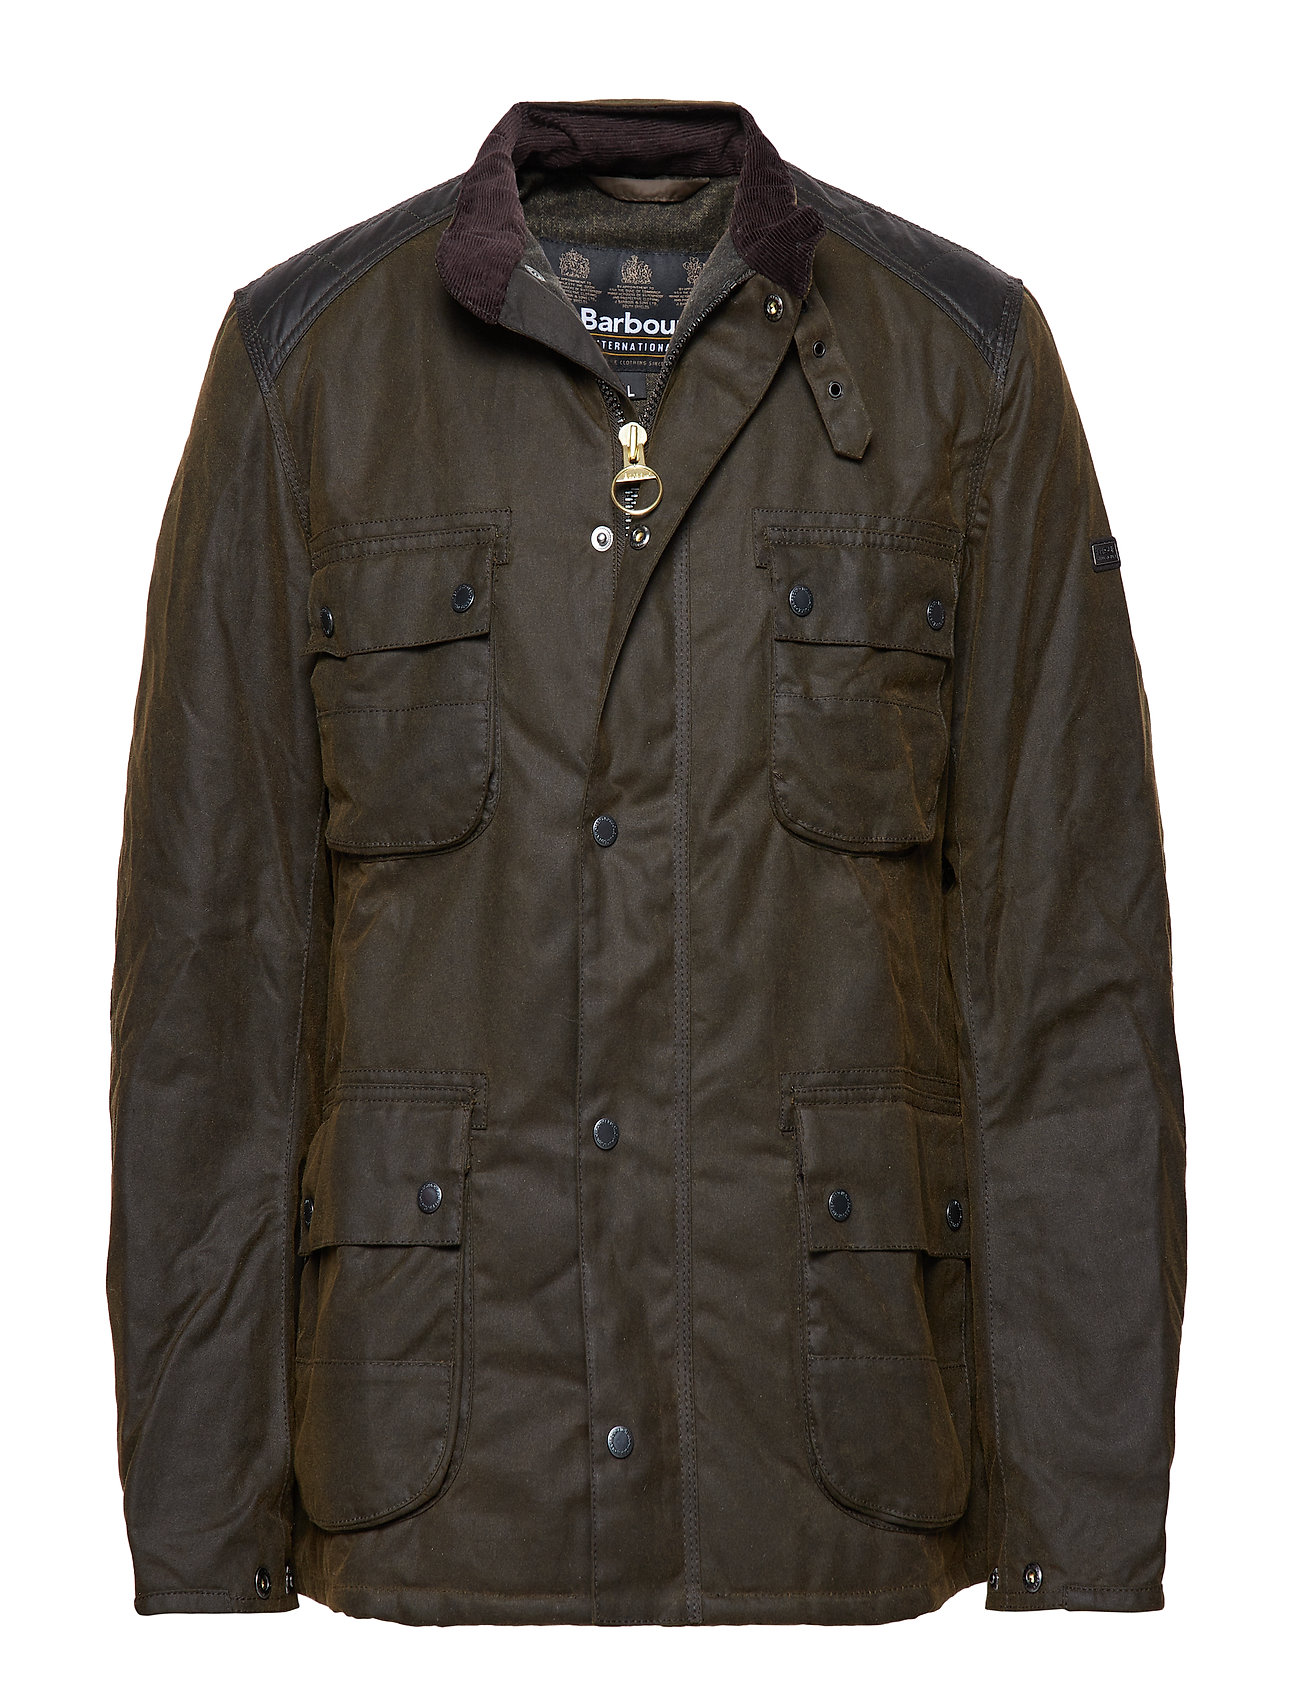 Barbour B.Intl Weir Wax Jacket - OLIVE